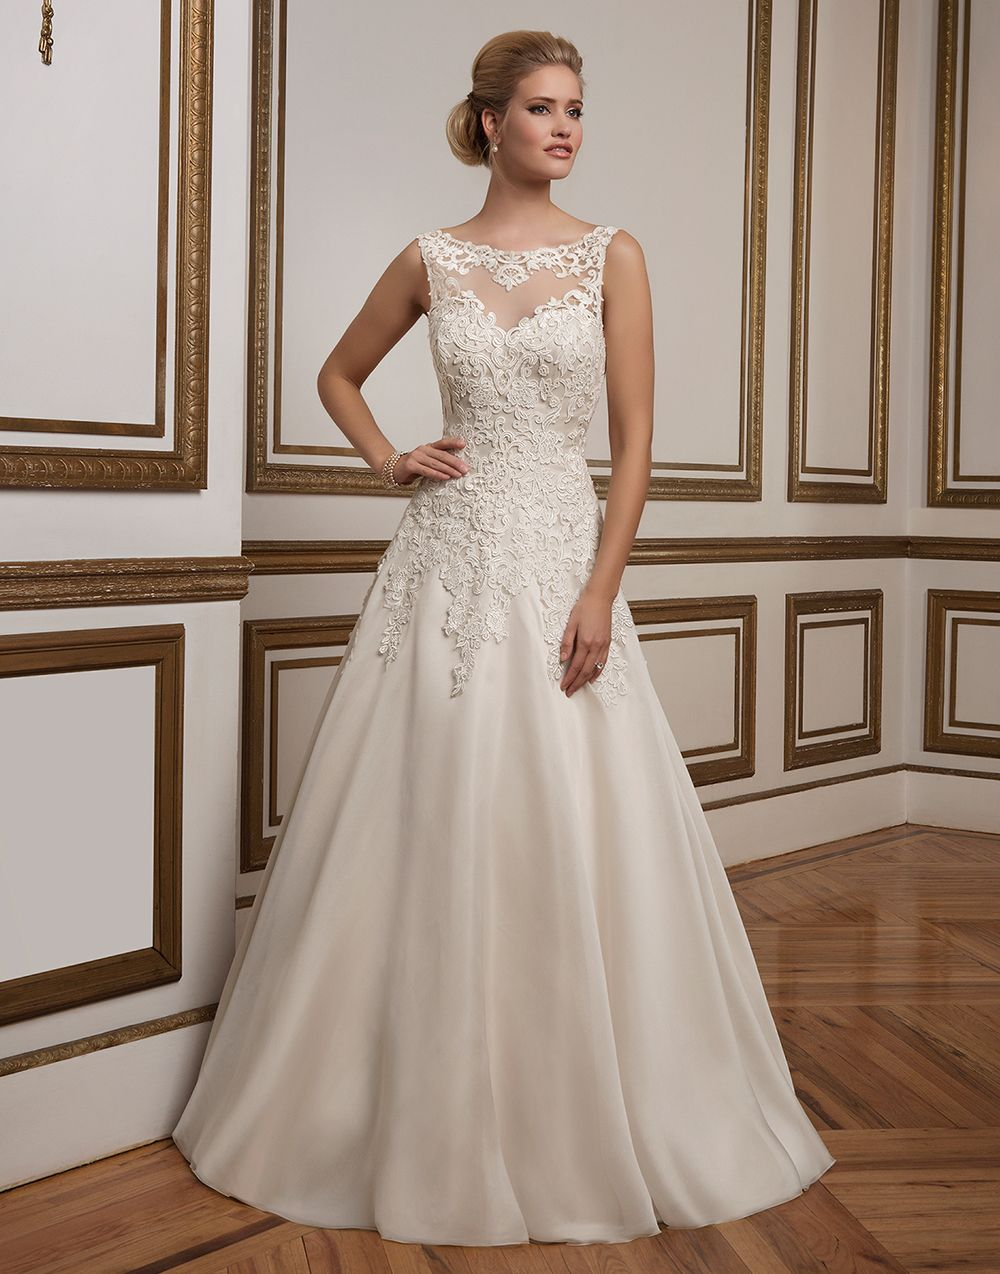 Justin alexander wedding dresses style illusion neckline